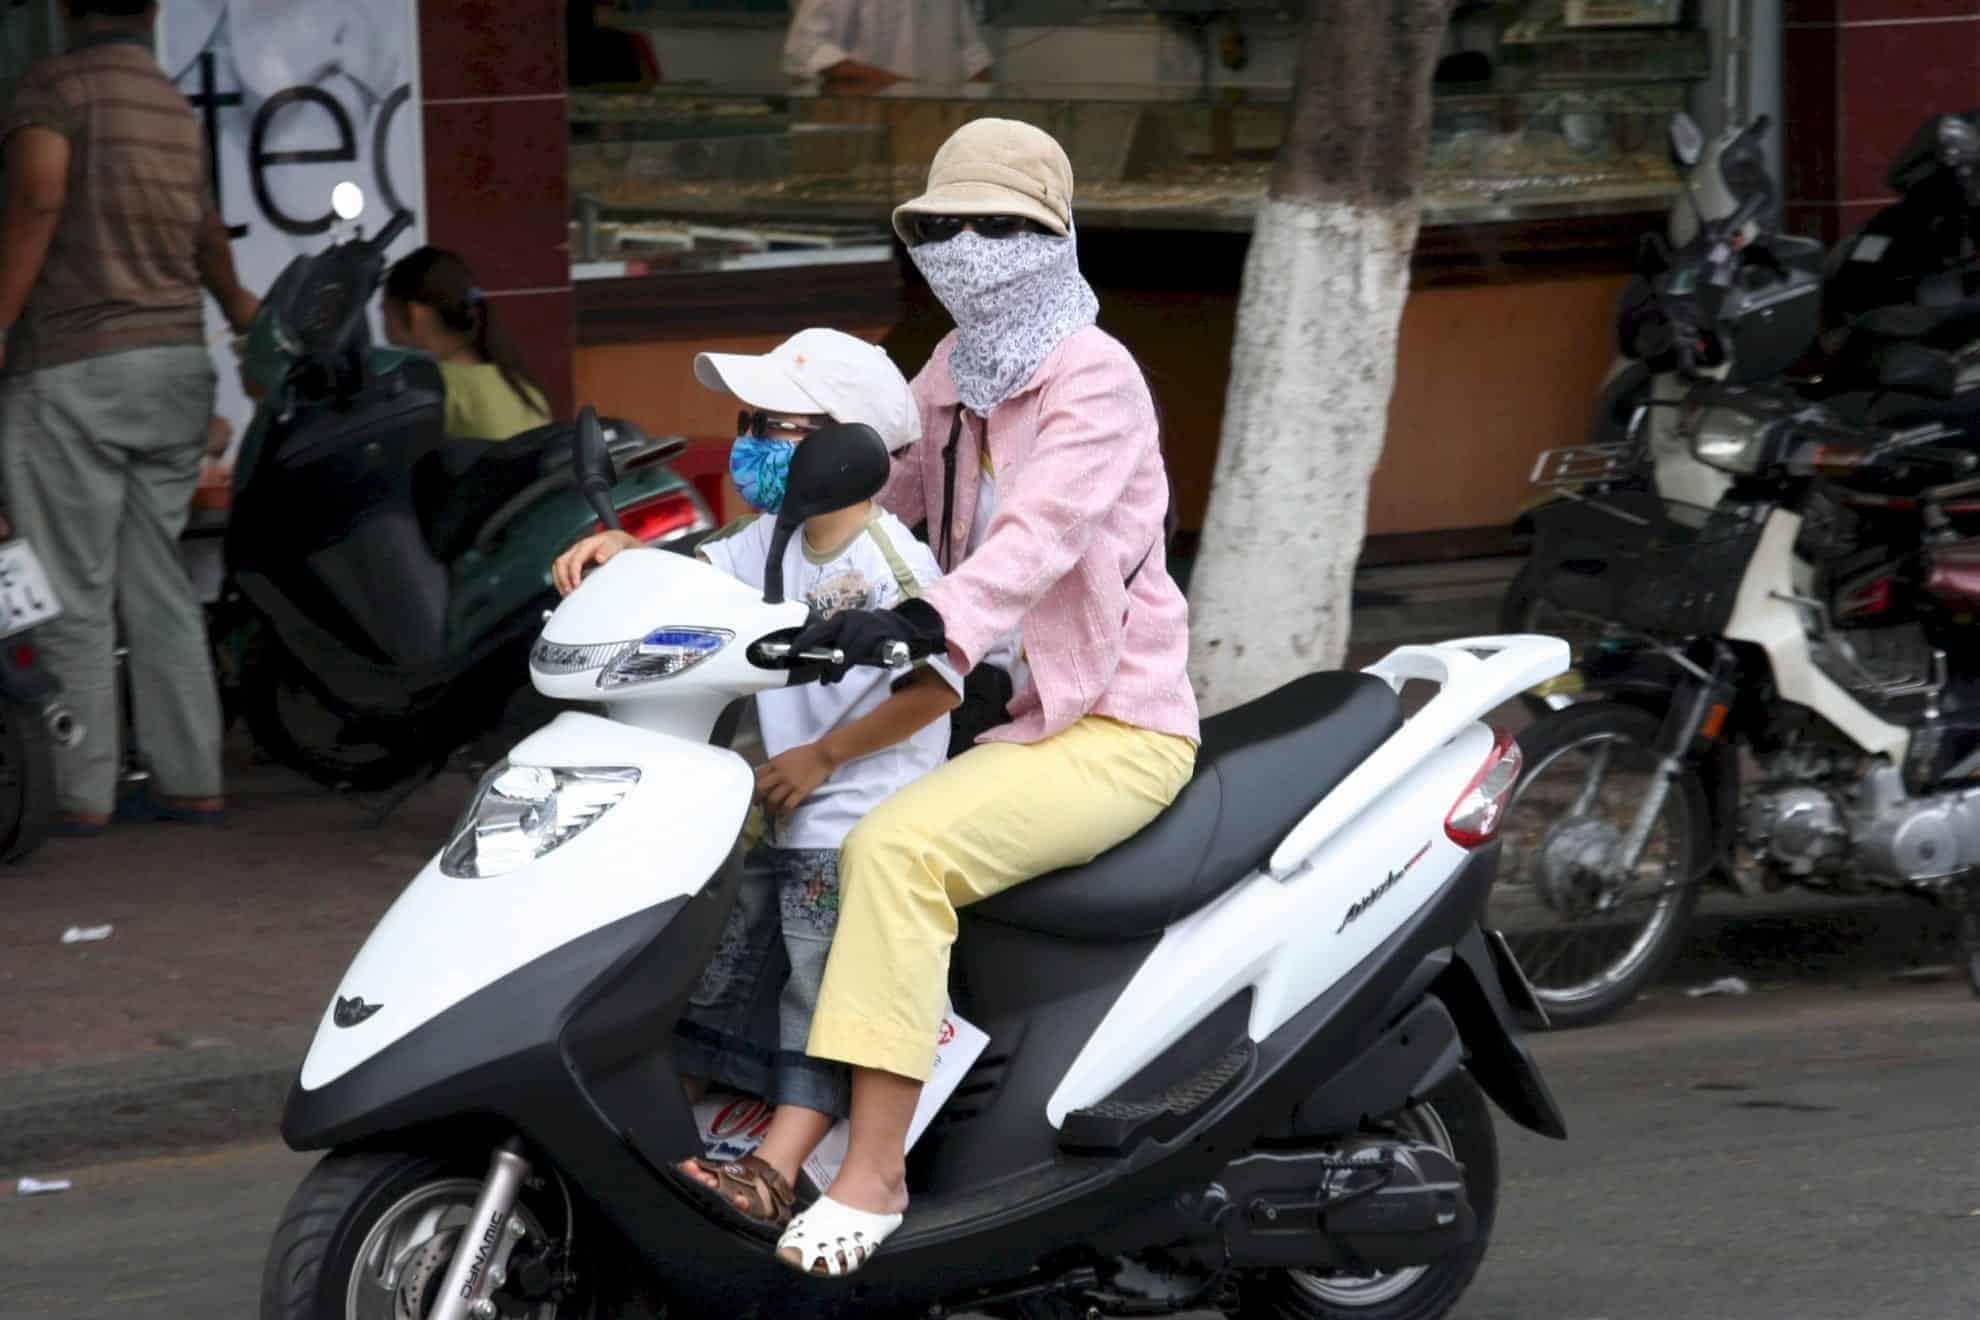 Children aboard Motorcycles